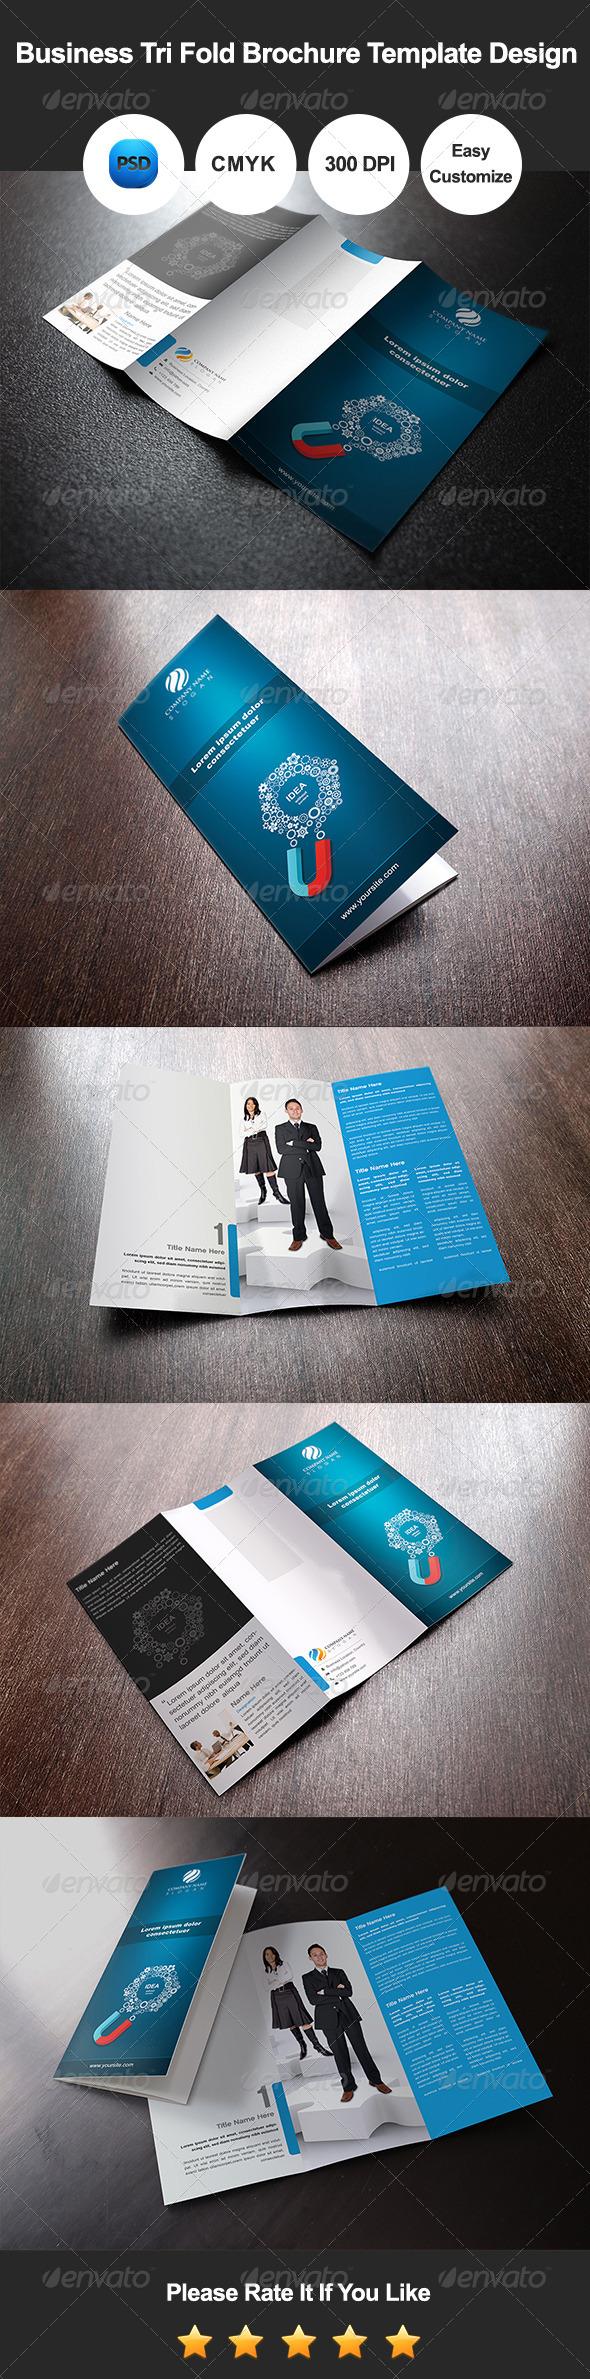 GraphicRiver Business Tri Fold Brochure Template Design 7679021